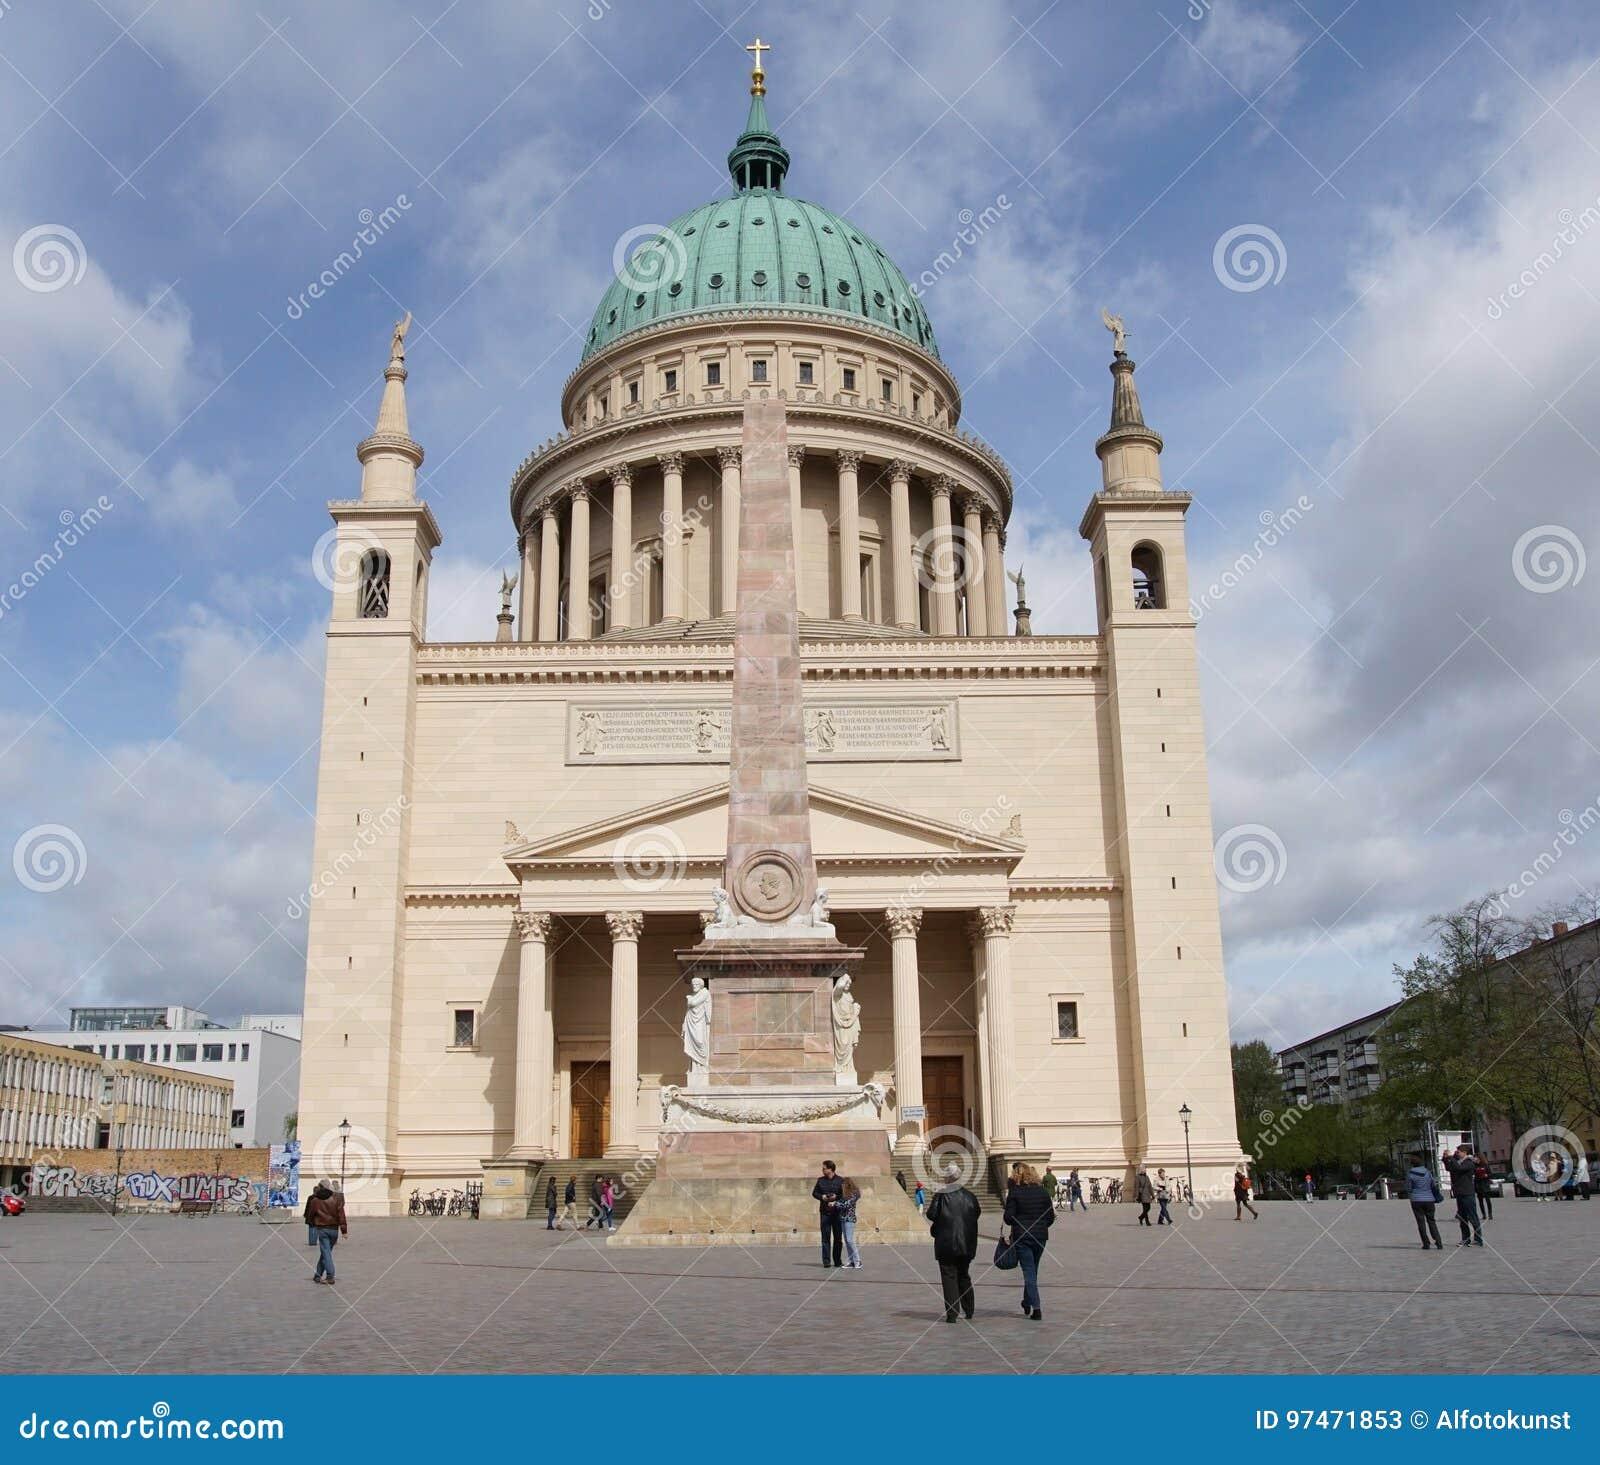 Historic Buildings Of Potsdam Germany Europe Editorial Stock Photo